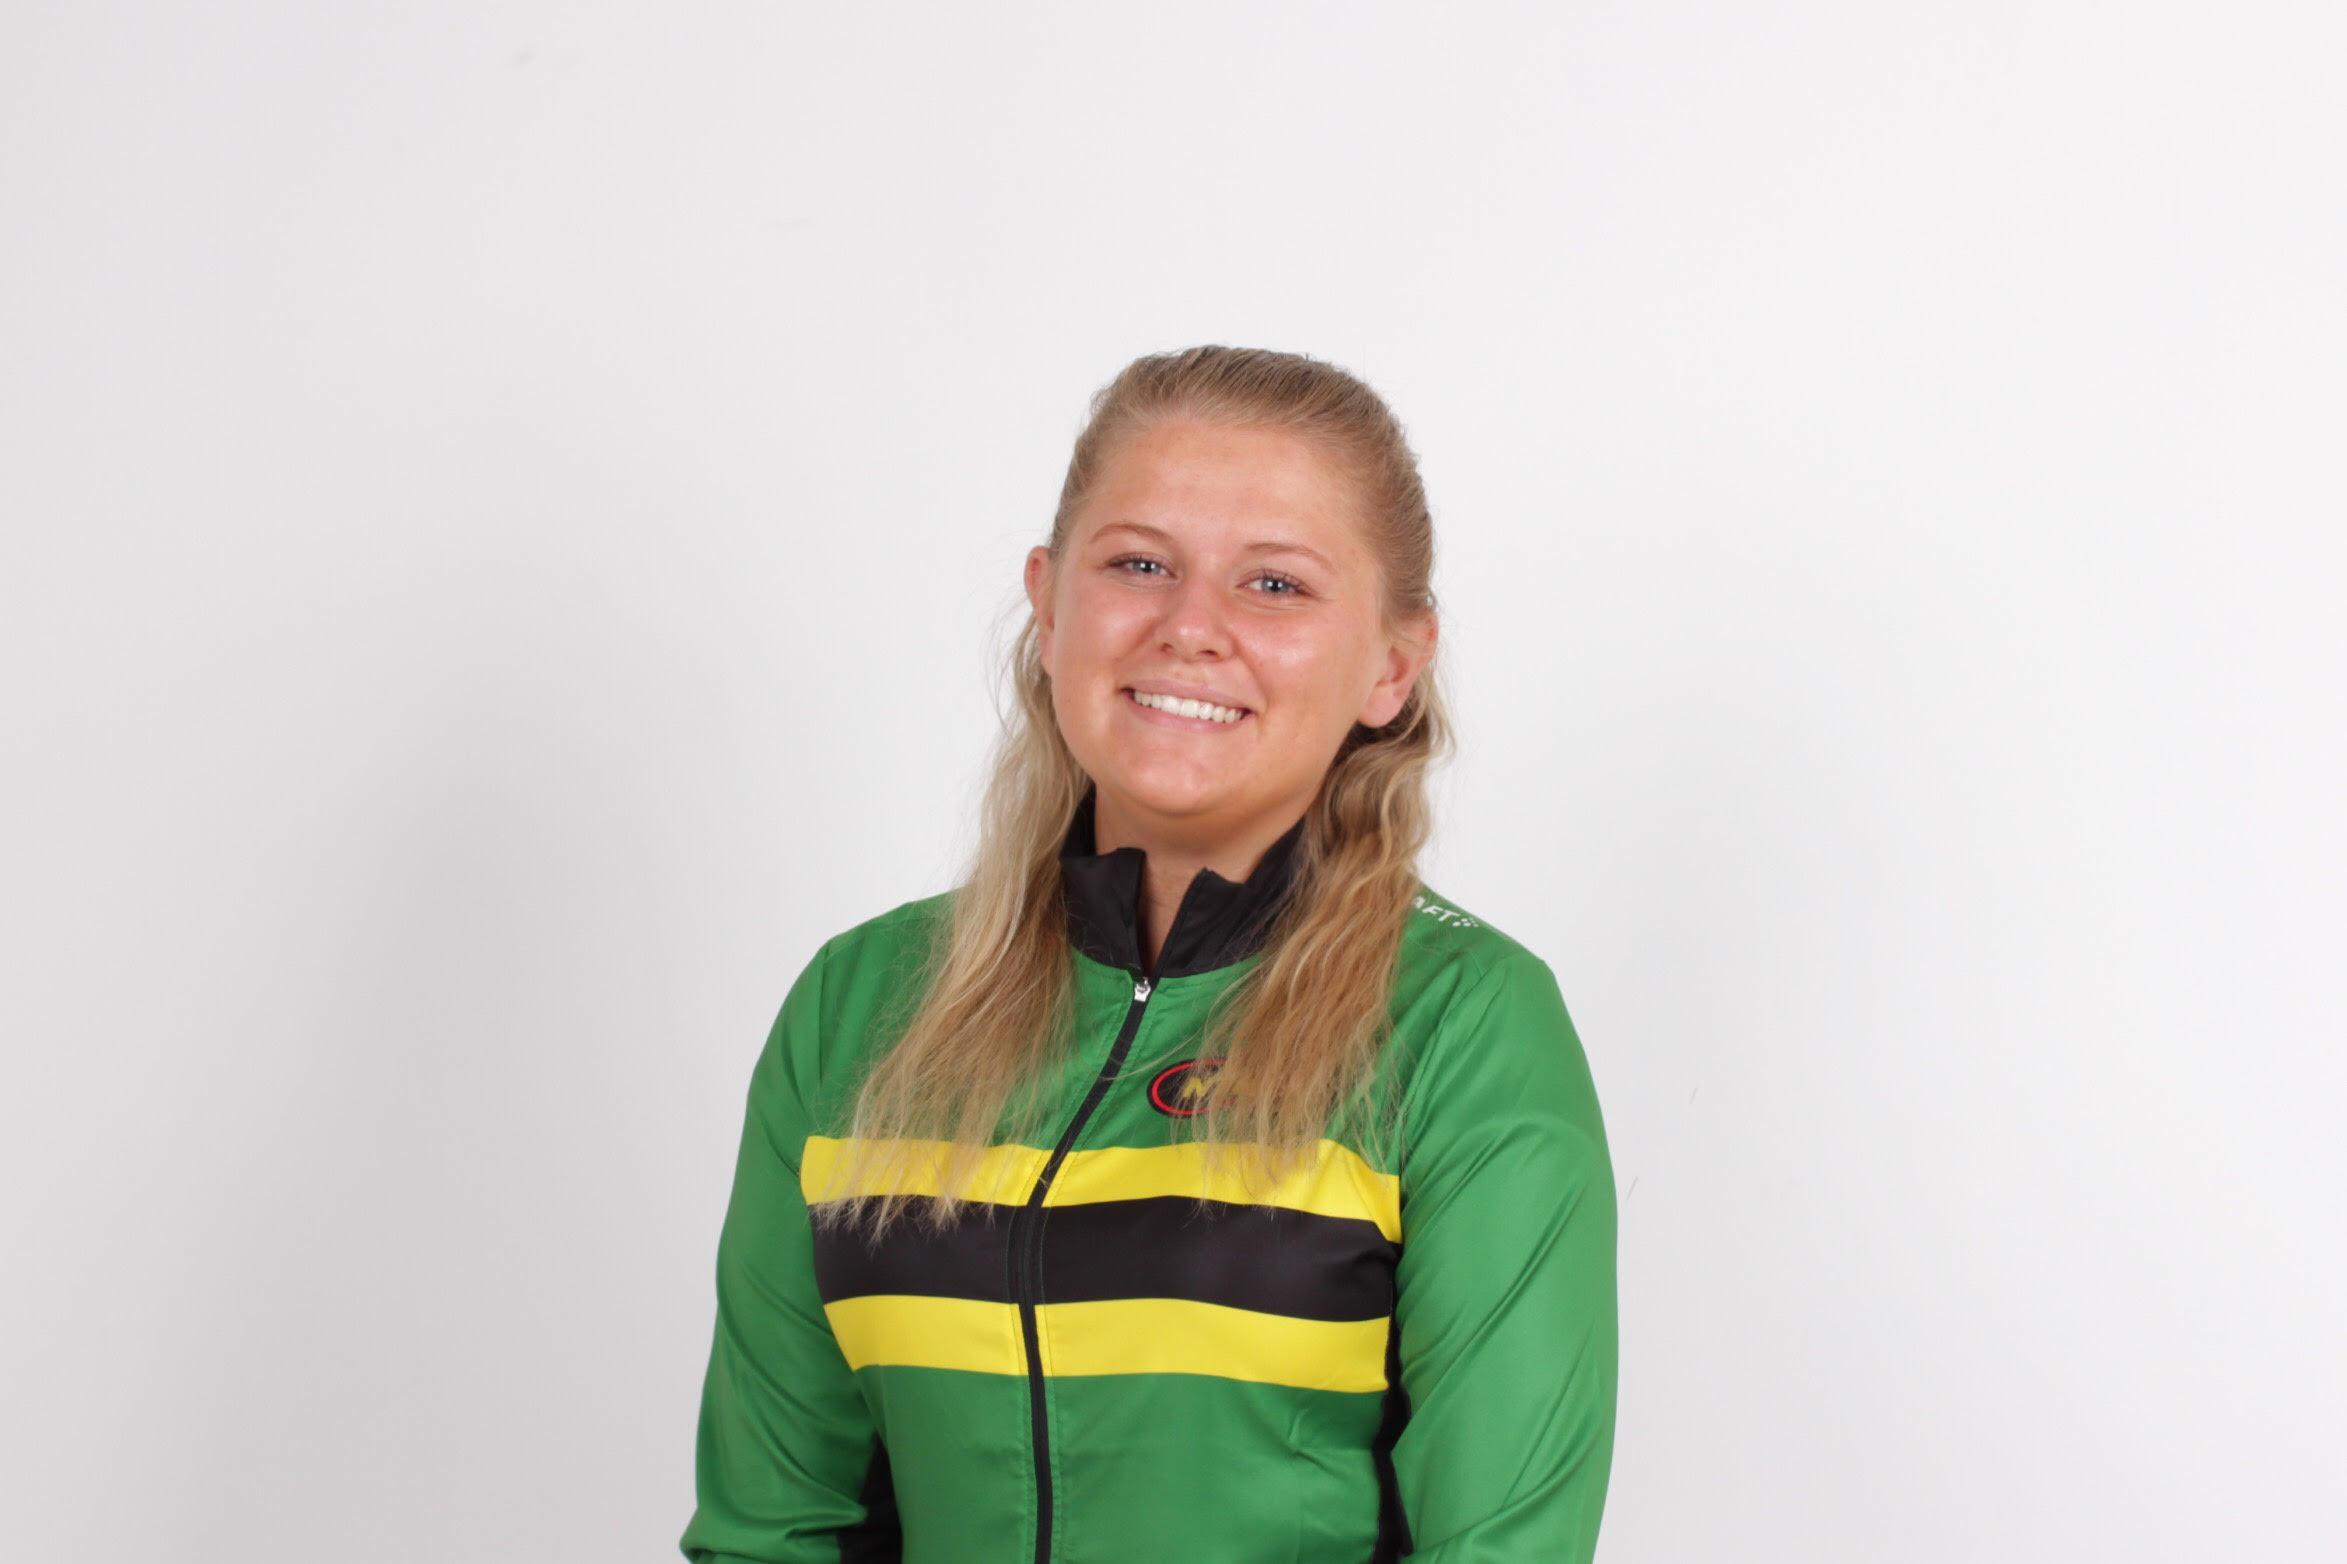 Marthe Bugge Eriksen